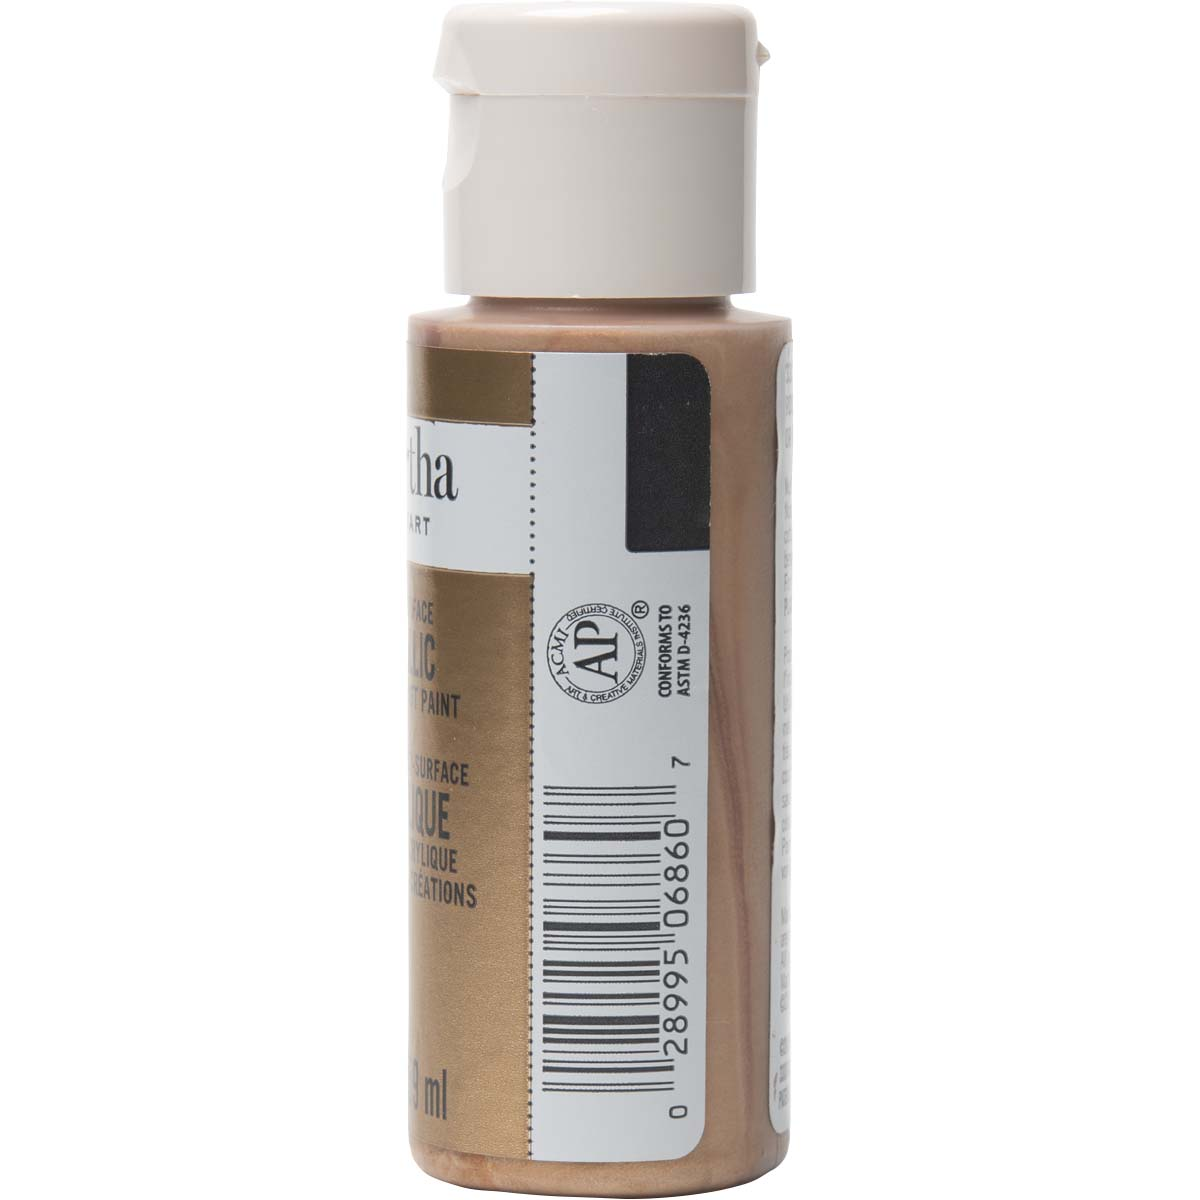 Martha Stewart ® Multi-Surface Metallic Acrylic Craft Paint - Rose Gold, 2 oz. - 33001CA